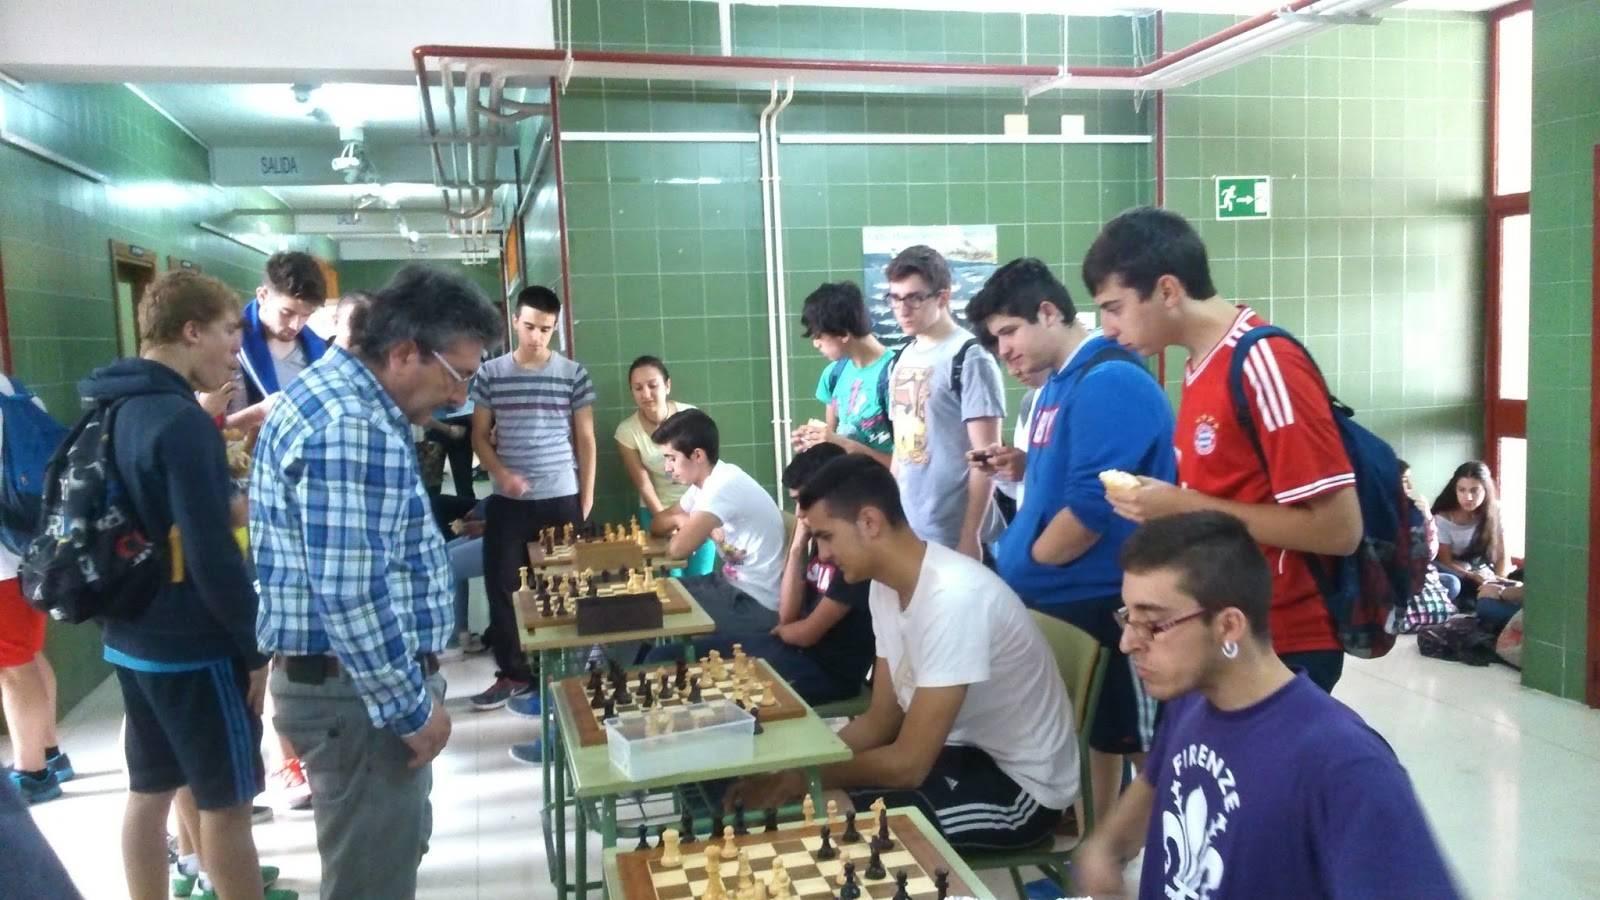 Campeonato de ajedrez Anthropos 2015